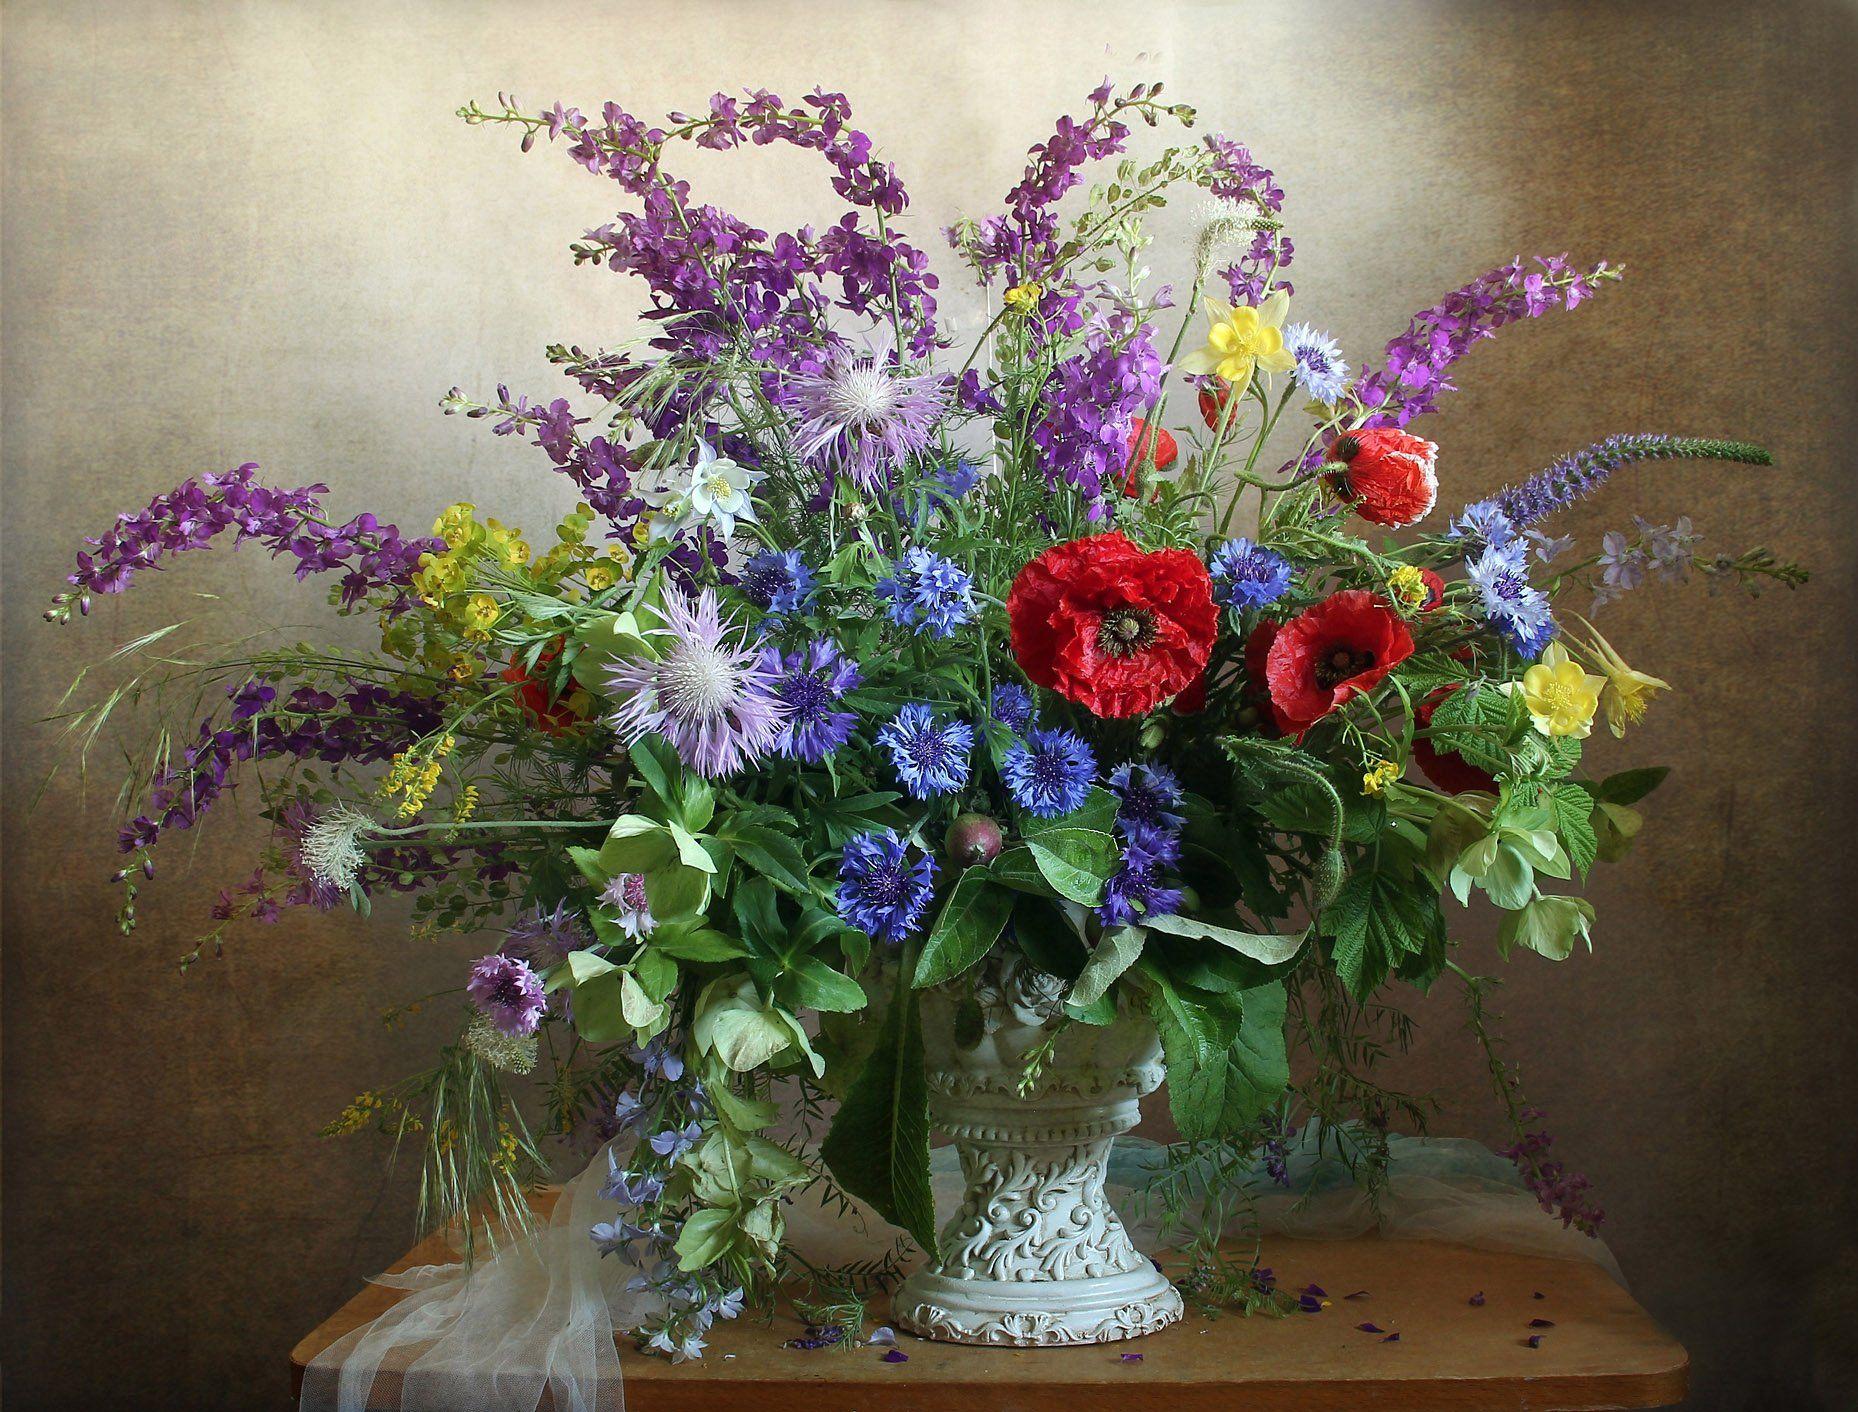 весна, натюрморт, букет цветов, маки, васильки, марина филатова, Филатова Марина